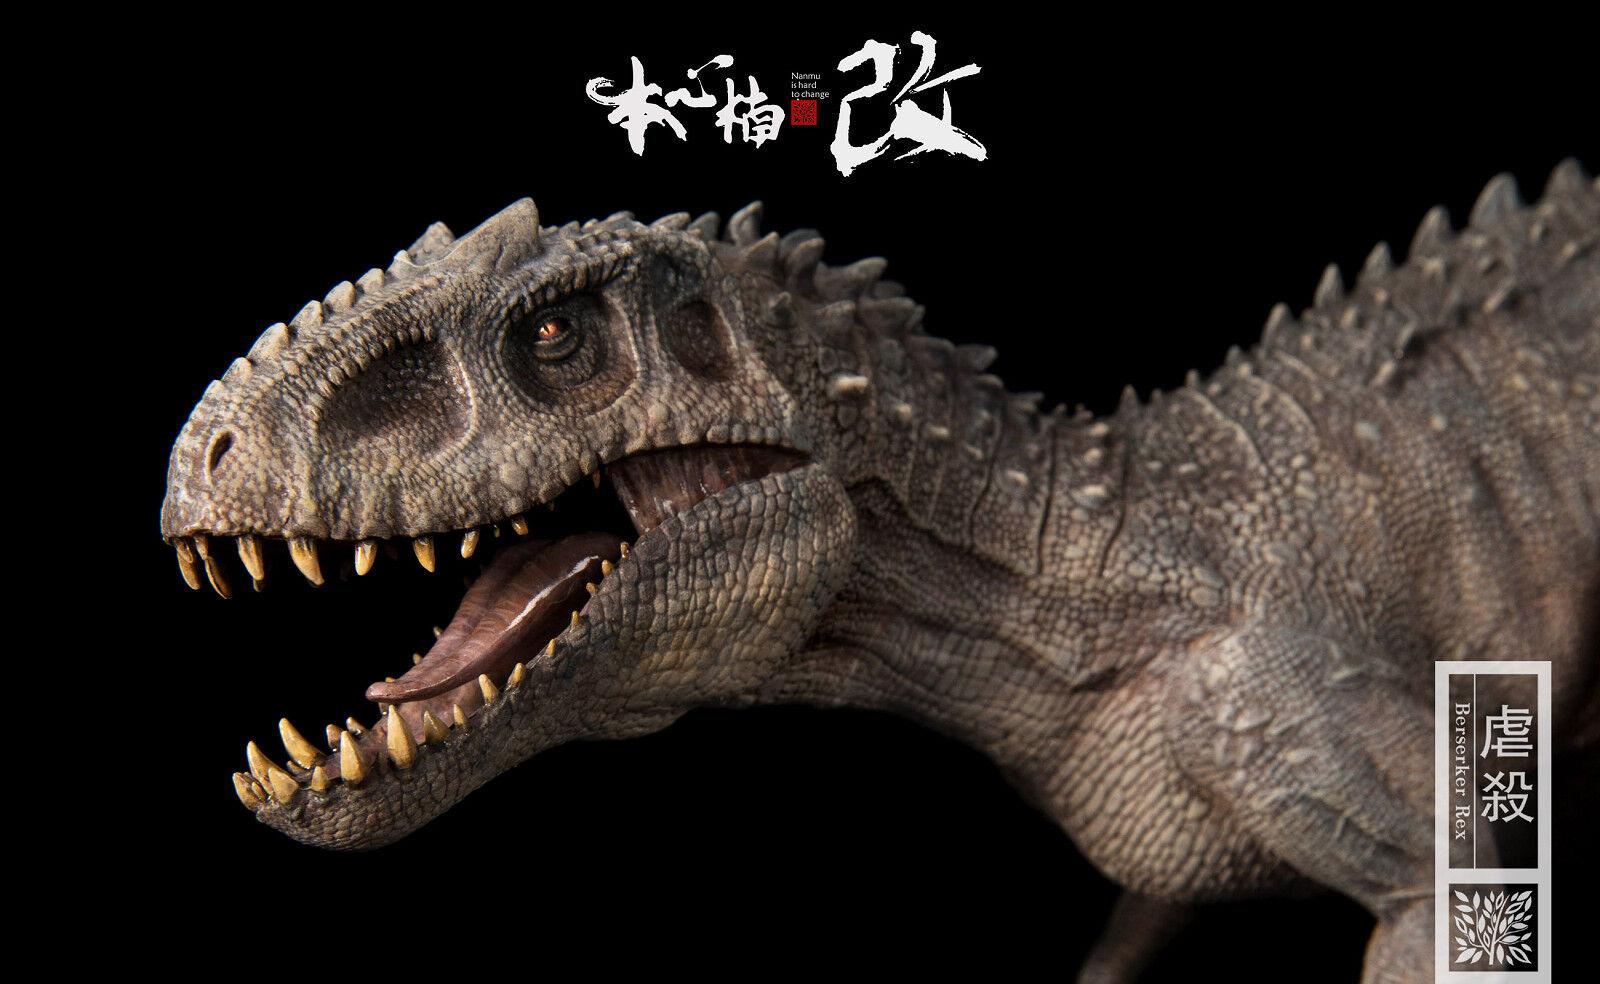 1 35 Scale Movies Series Dinosaur Animal Model Bereserker Rex PVC Figure Collect